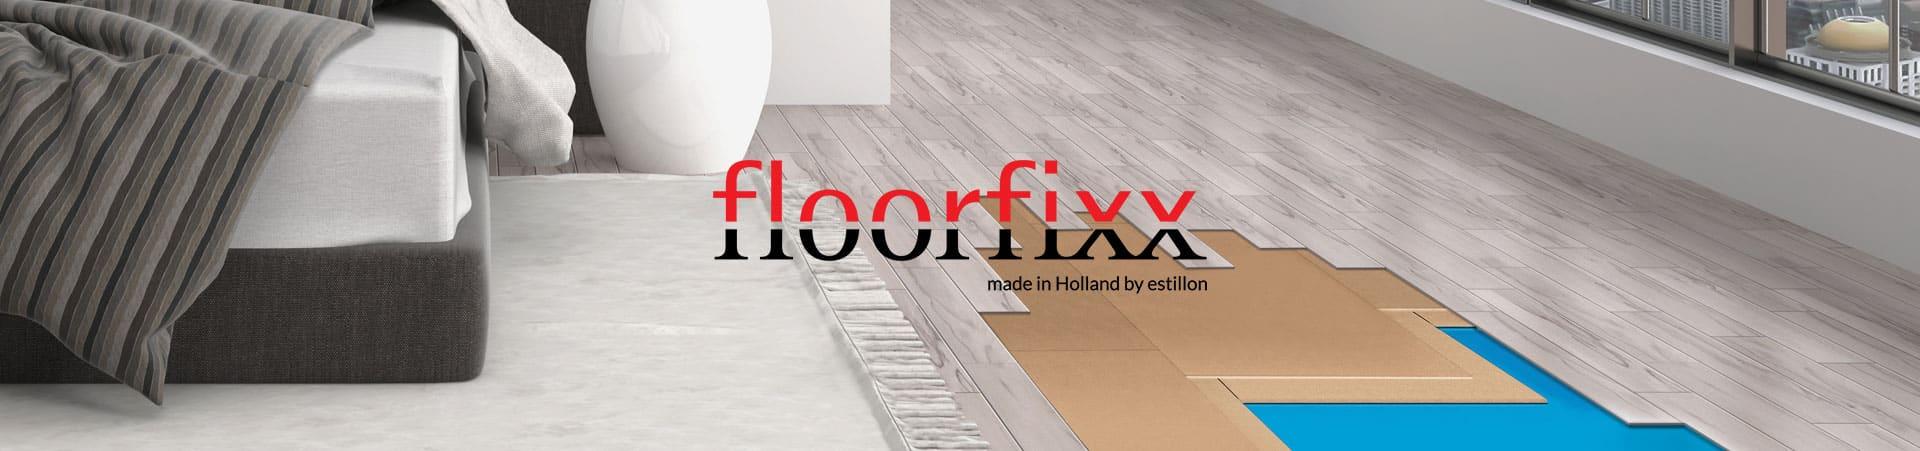 Floorfixx underlays